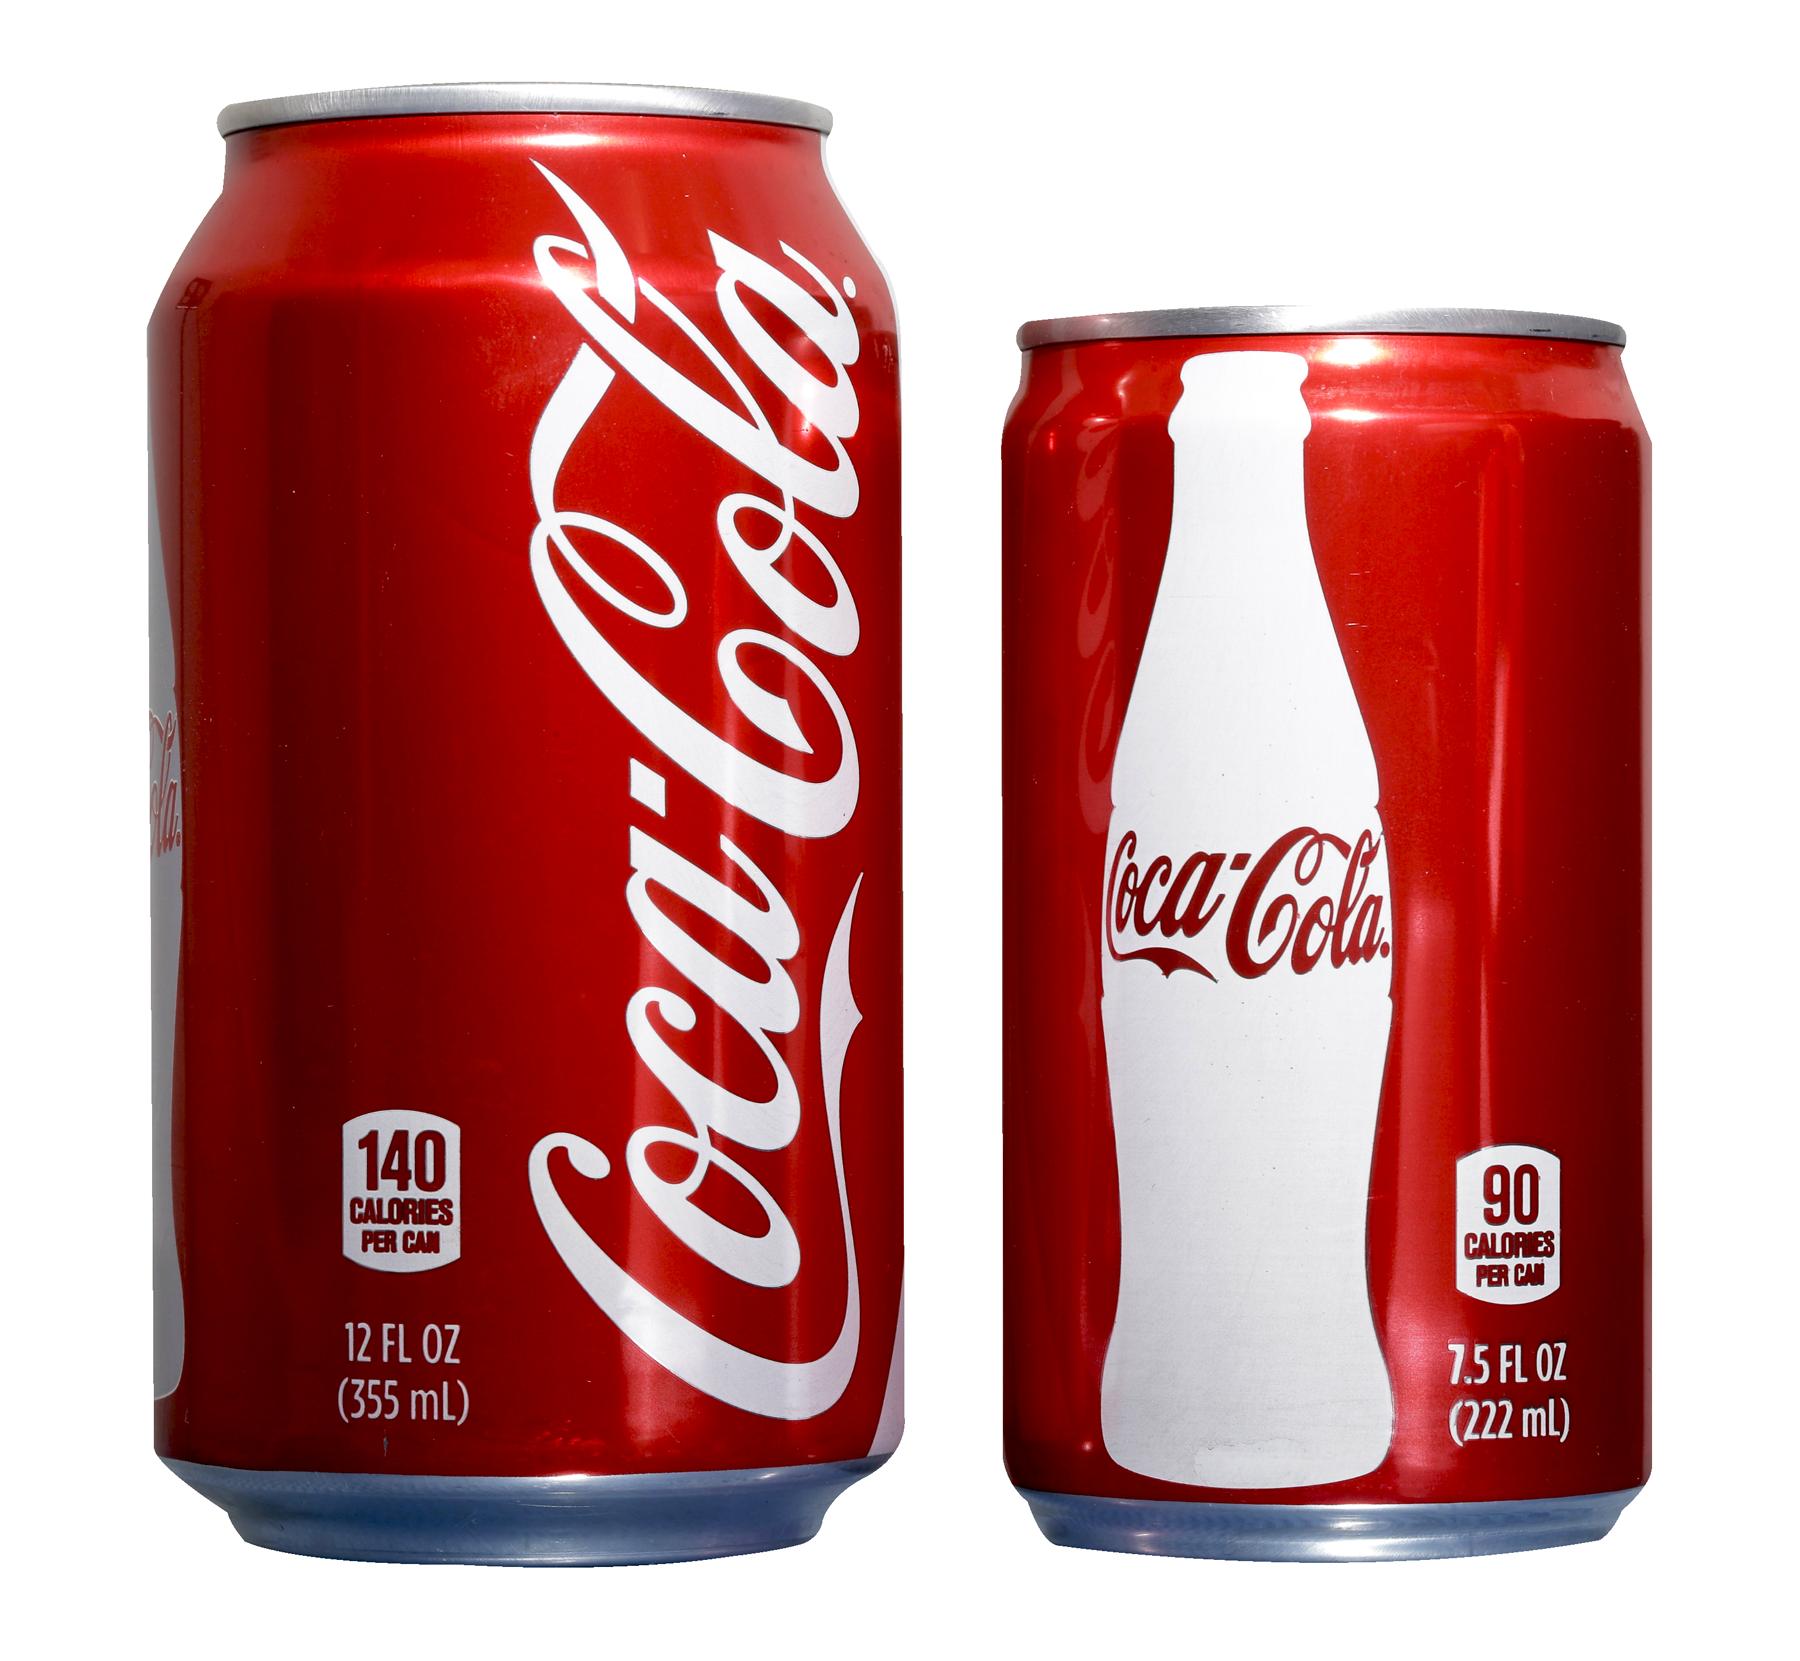 Png Soda Can - Png Soda Can Hdpng.com 1800, Transparent background PNG HD thumbnail